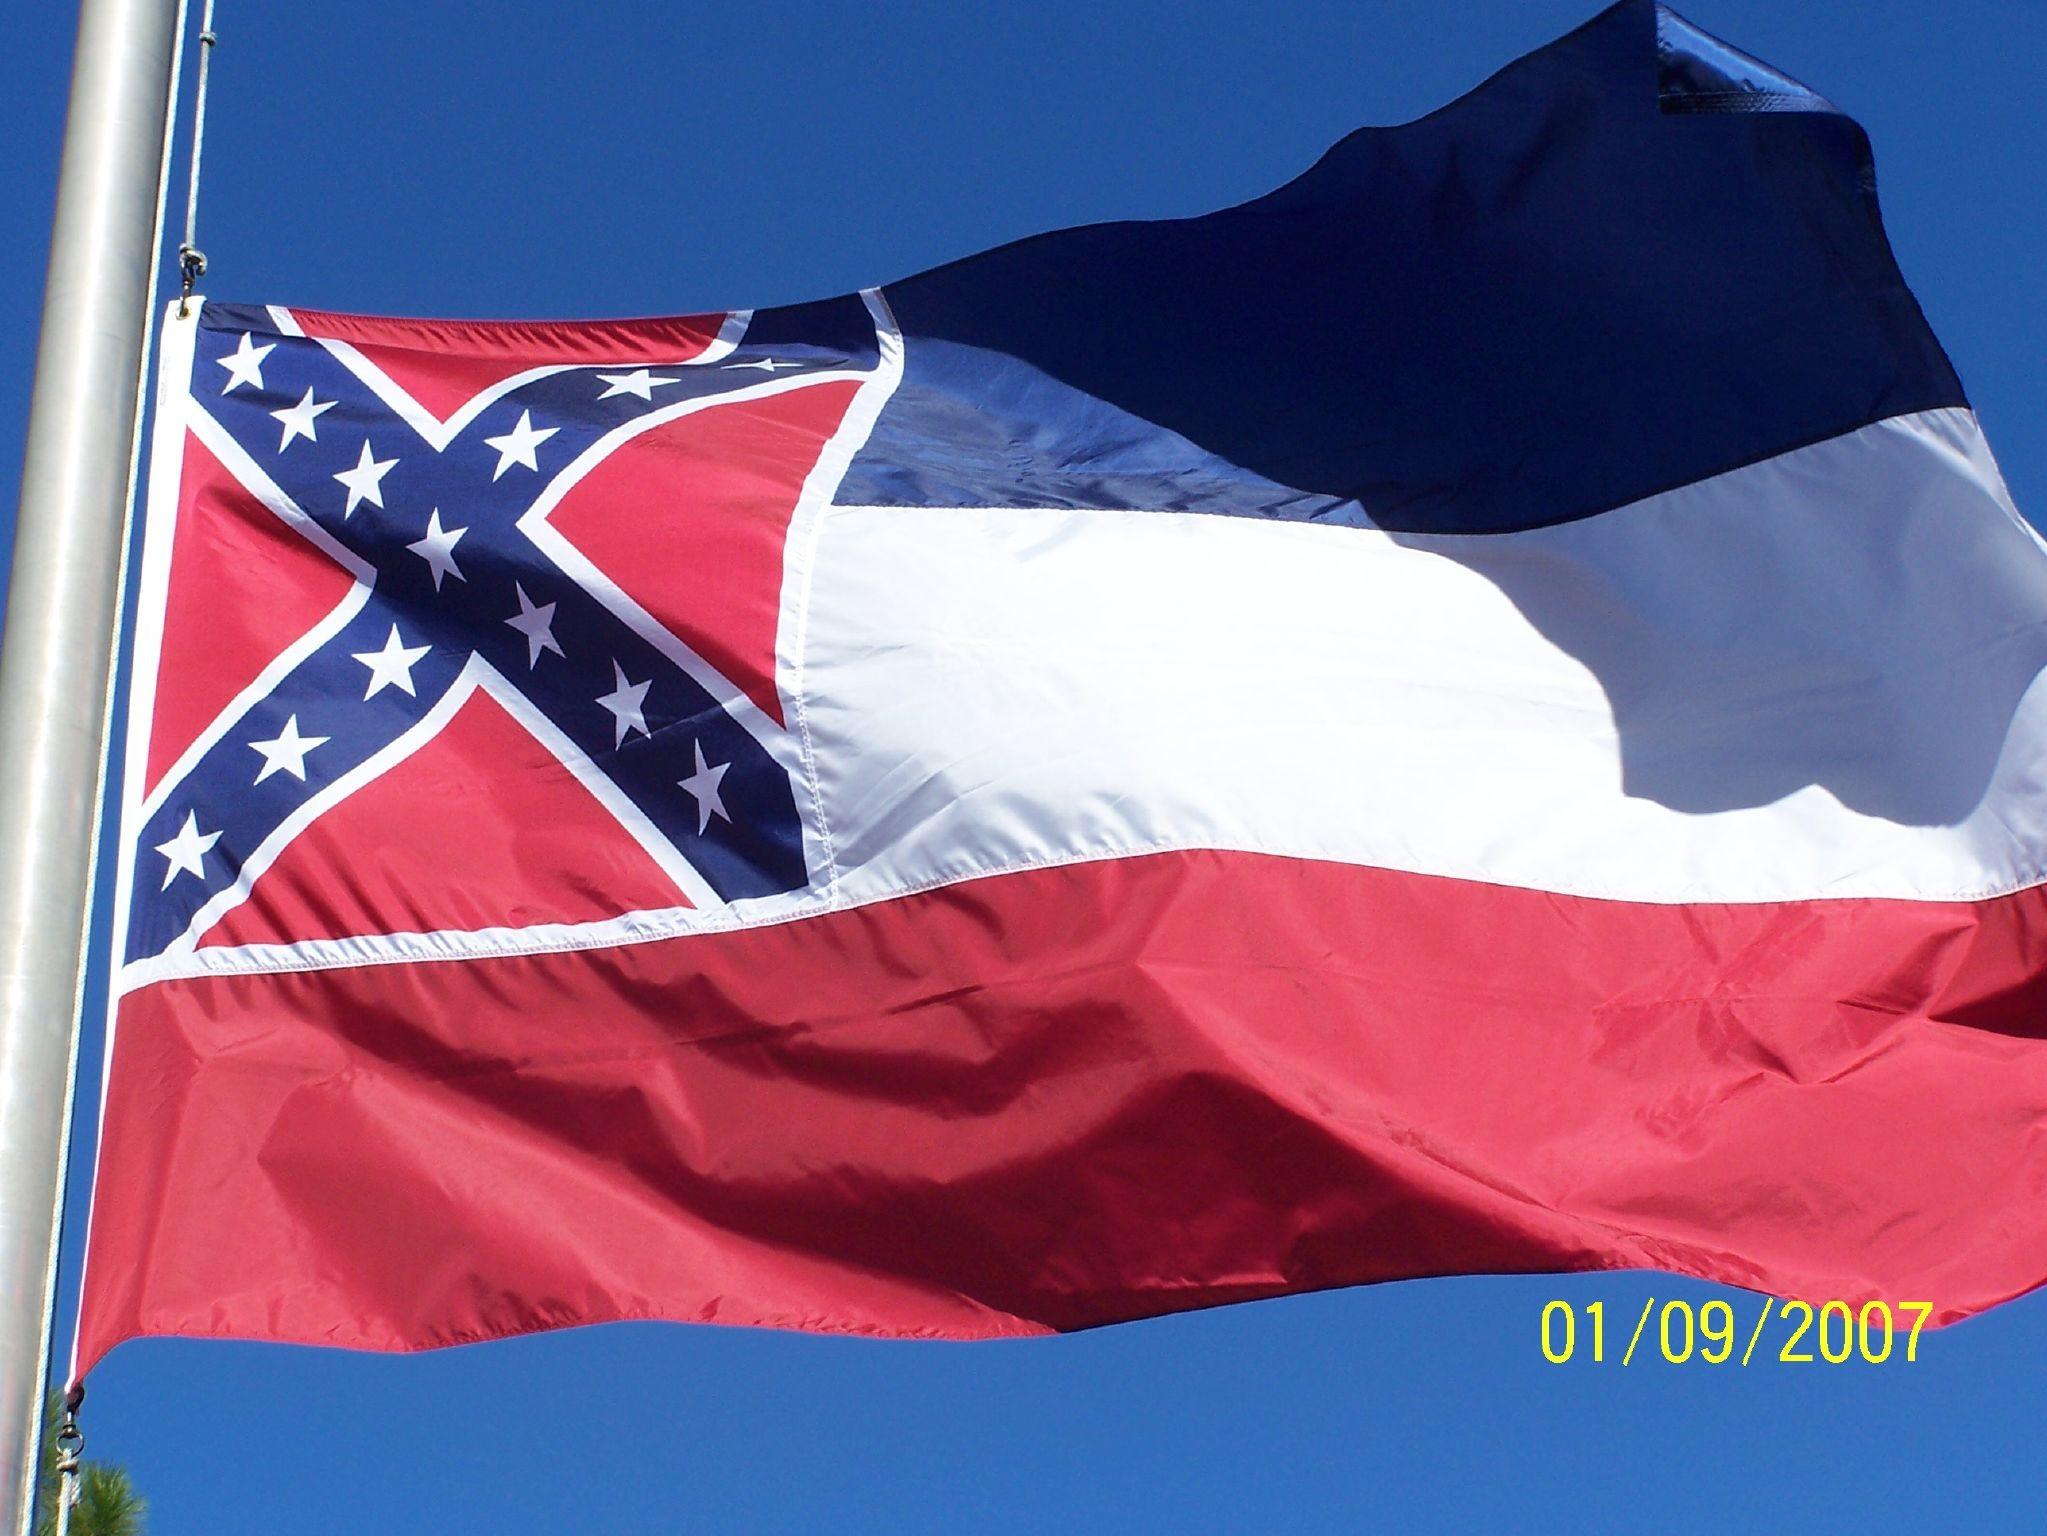 1080x1920 Iphone 6 Misc Confederate Flag Wallpaper Id 451502